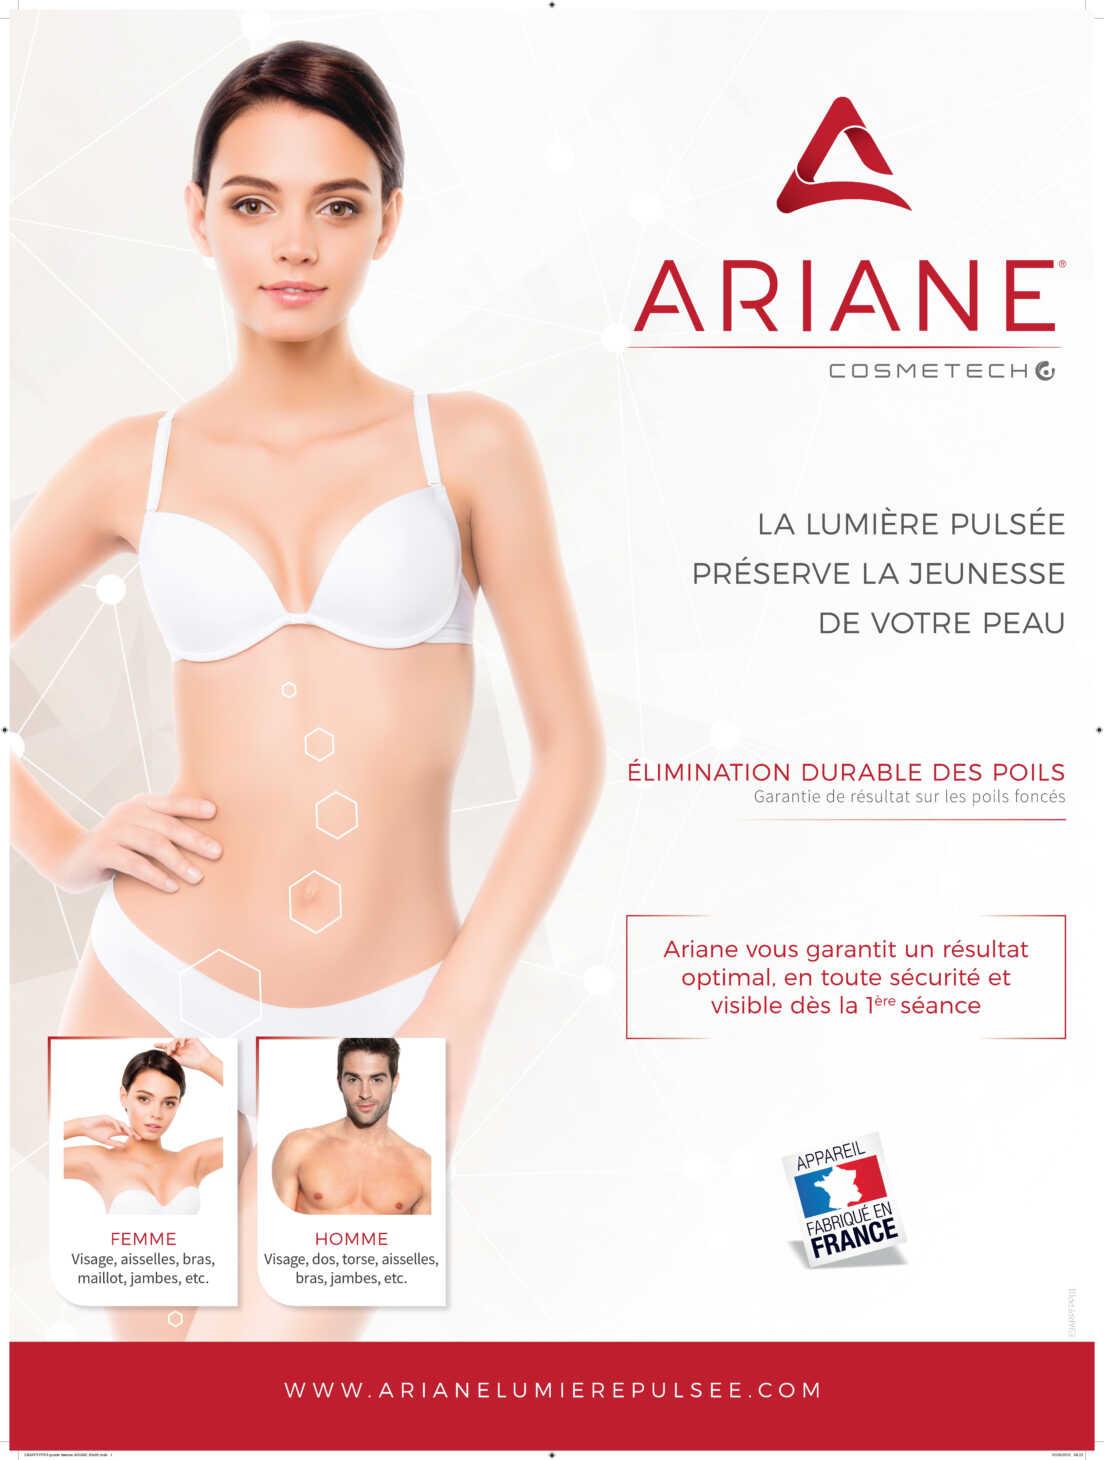 E9ARPFPP01-poster-femme-ARIANE-60x80-1